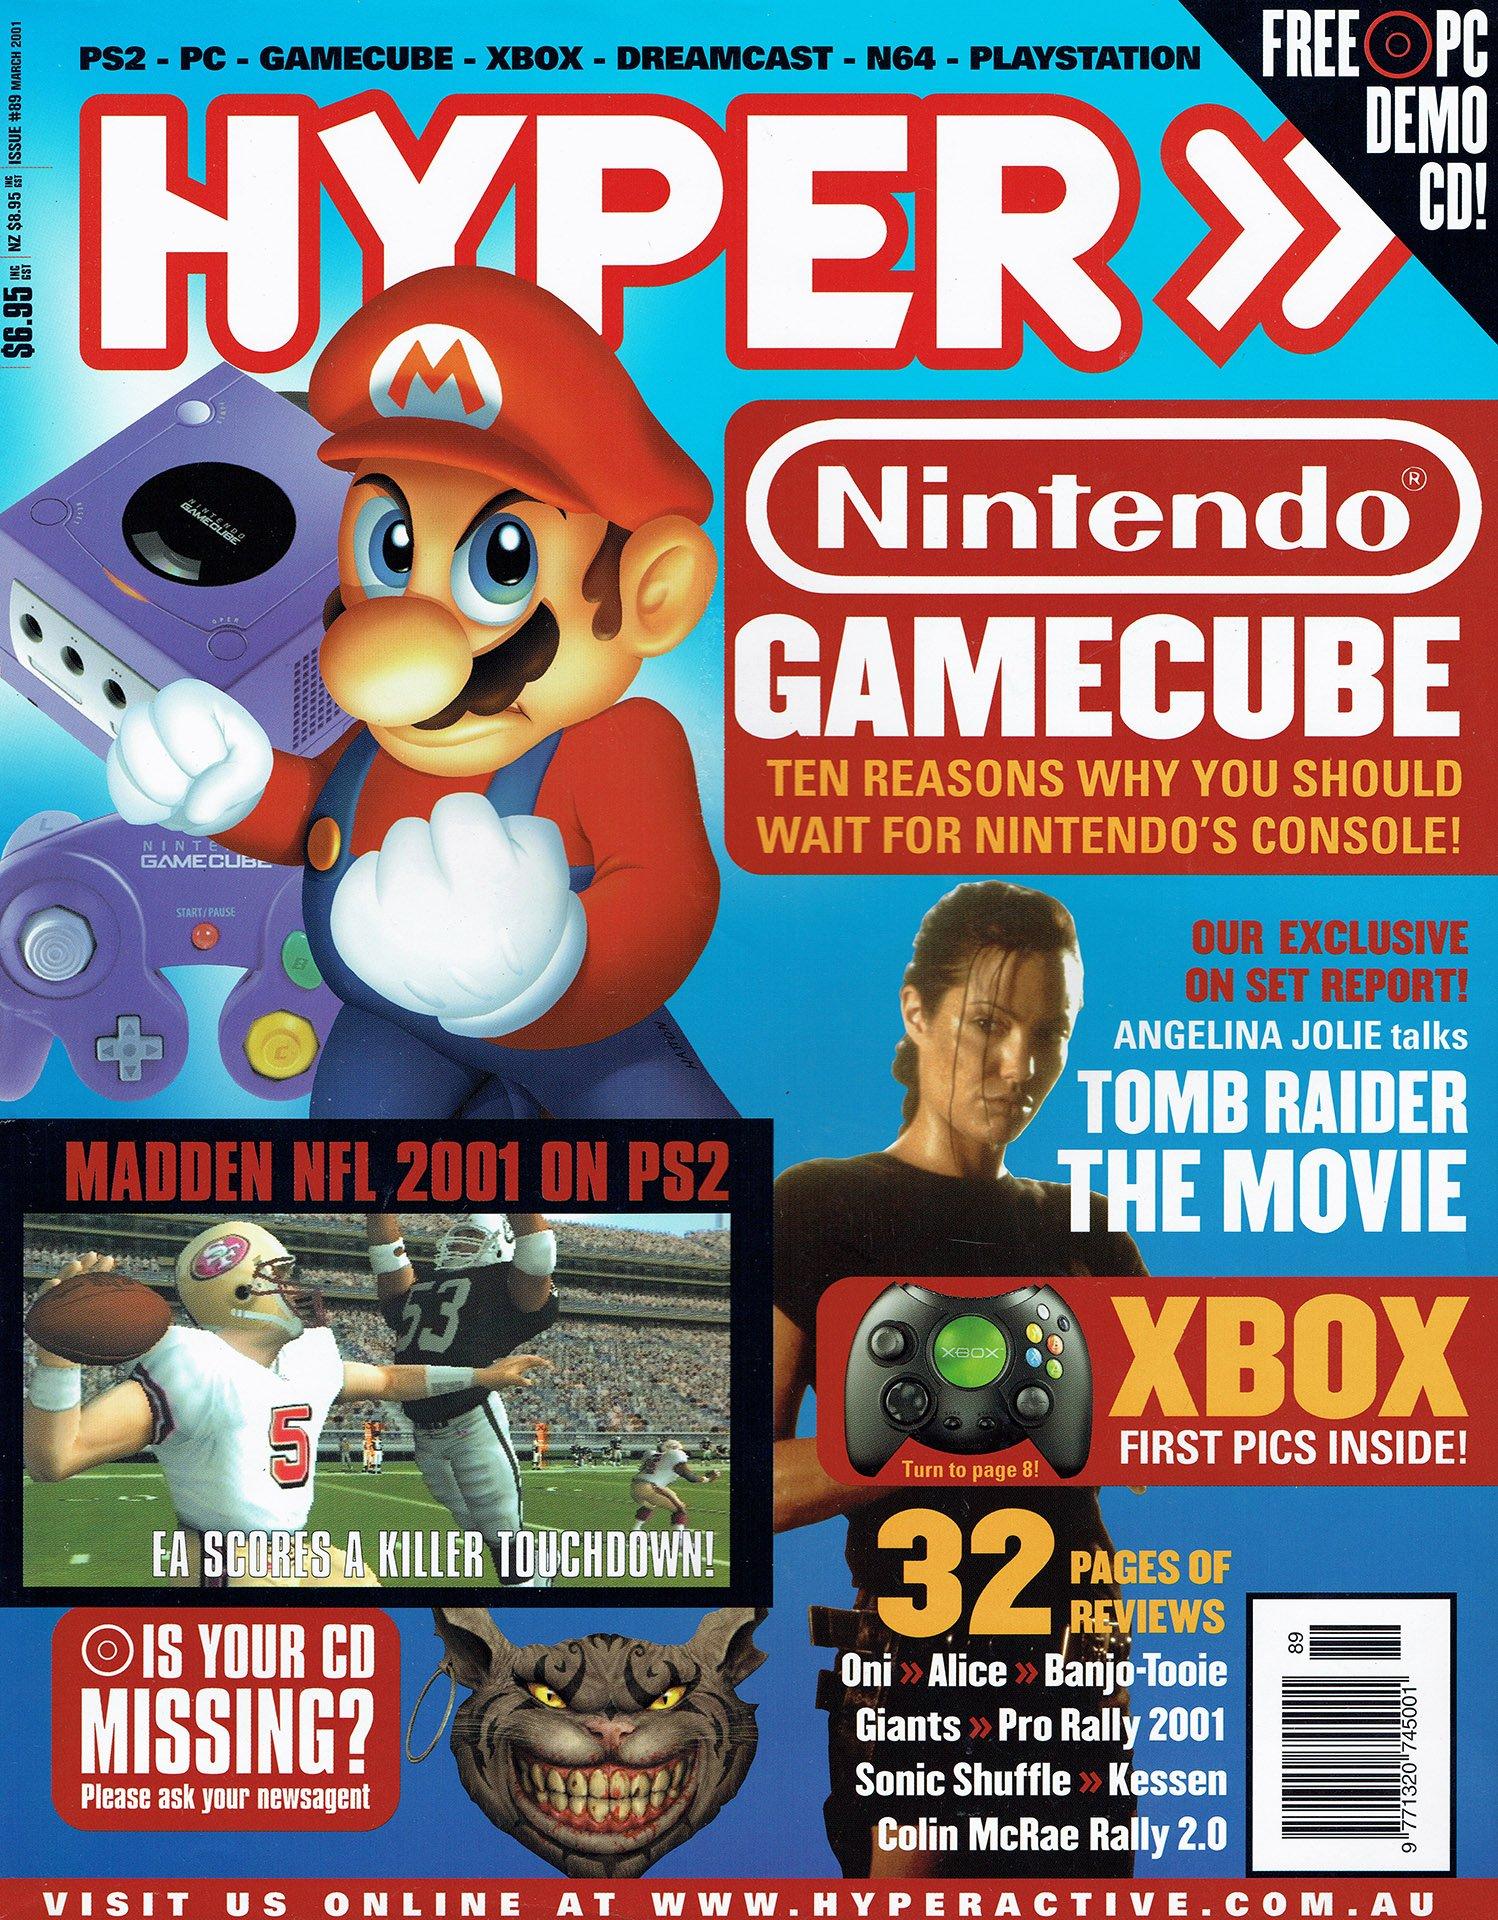 Hyper 089 (March 2001)